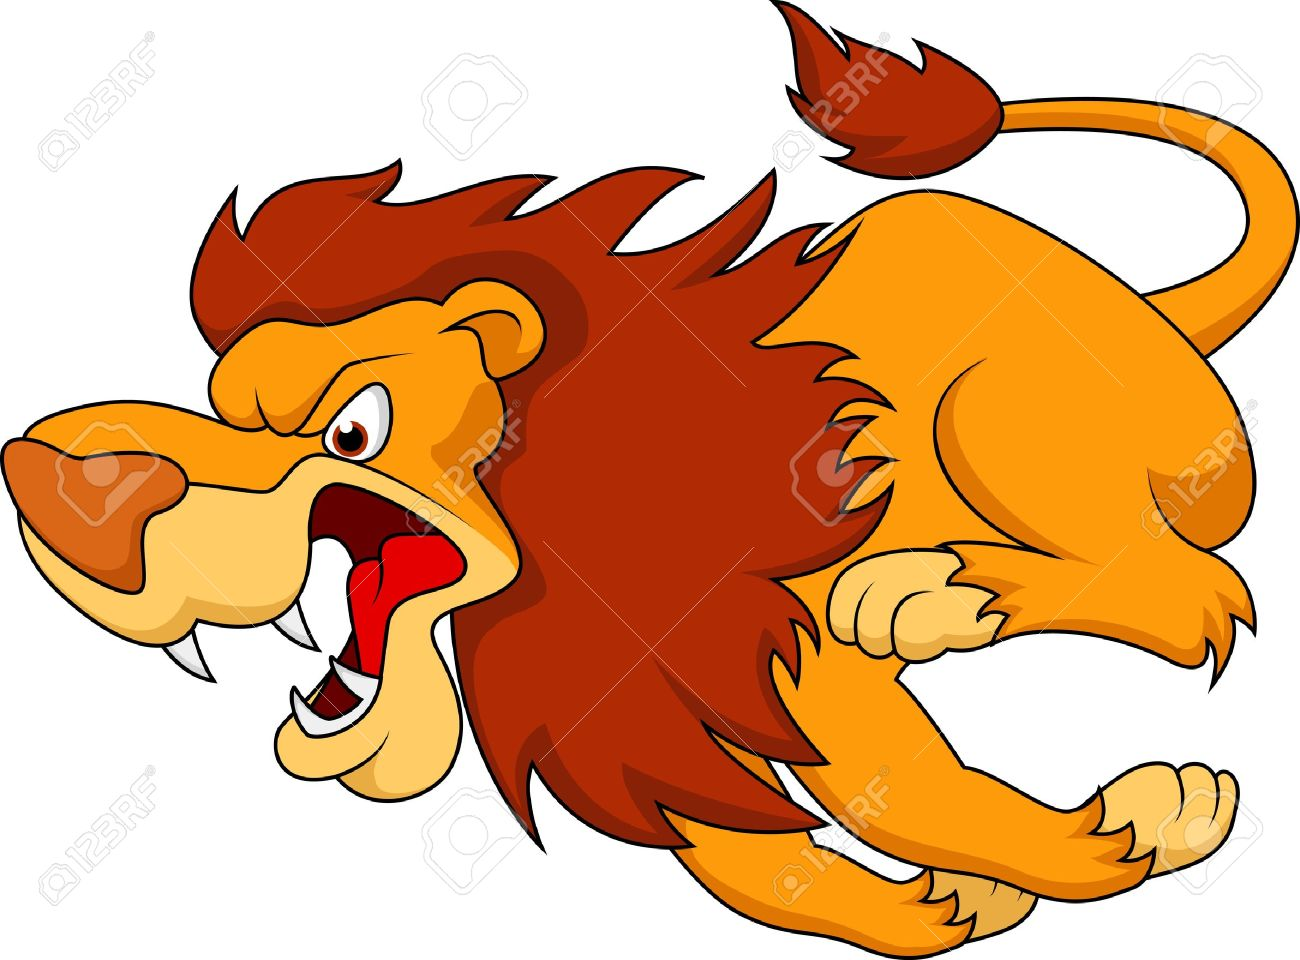 lion cartoon running Stock Vector - 21193855